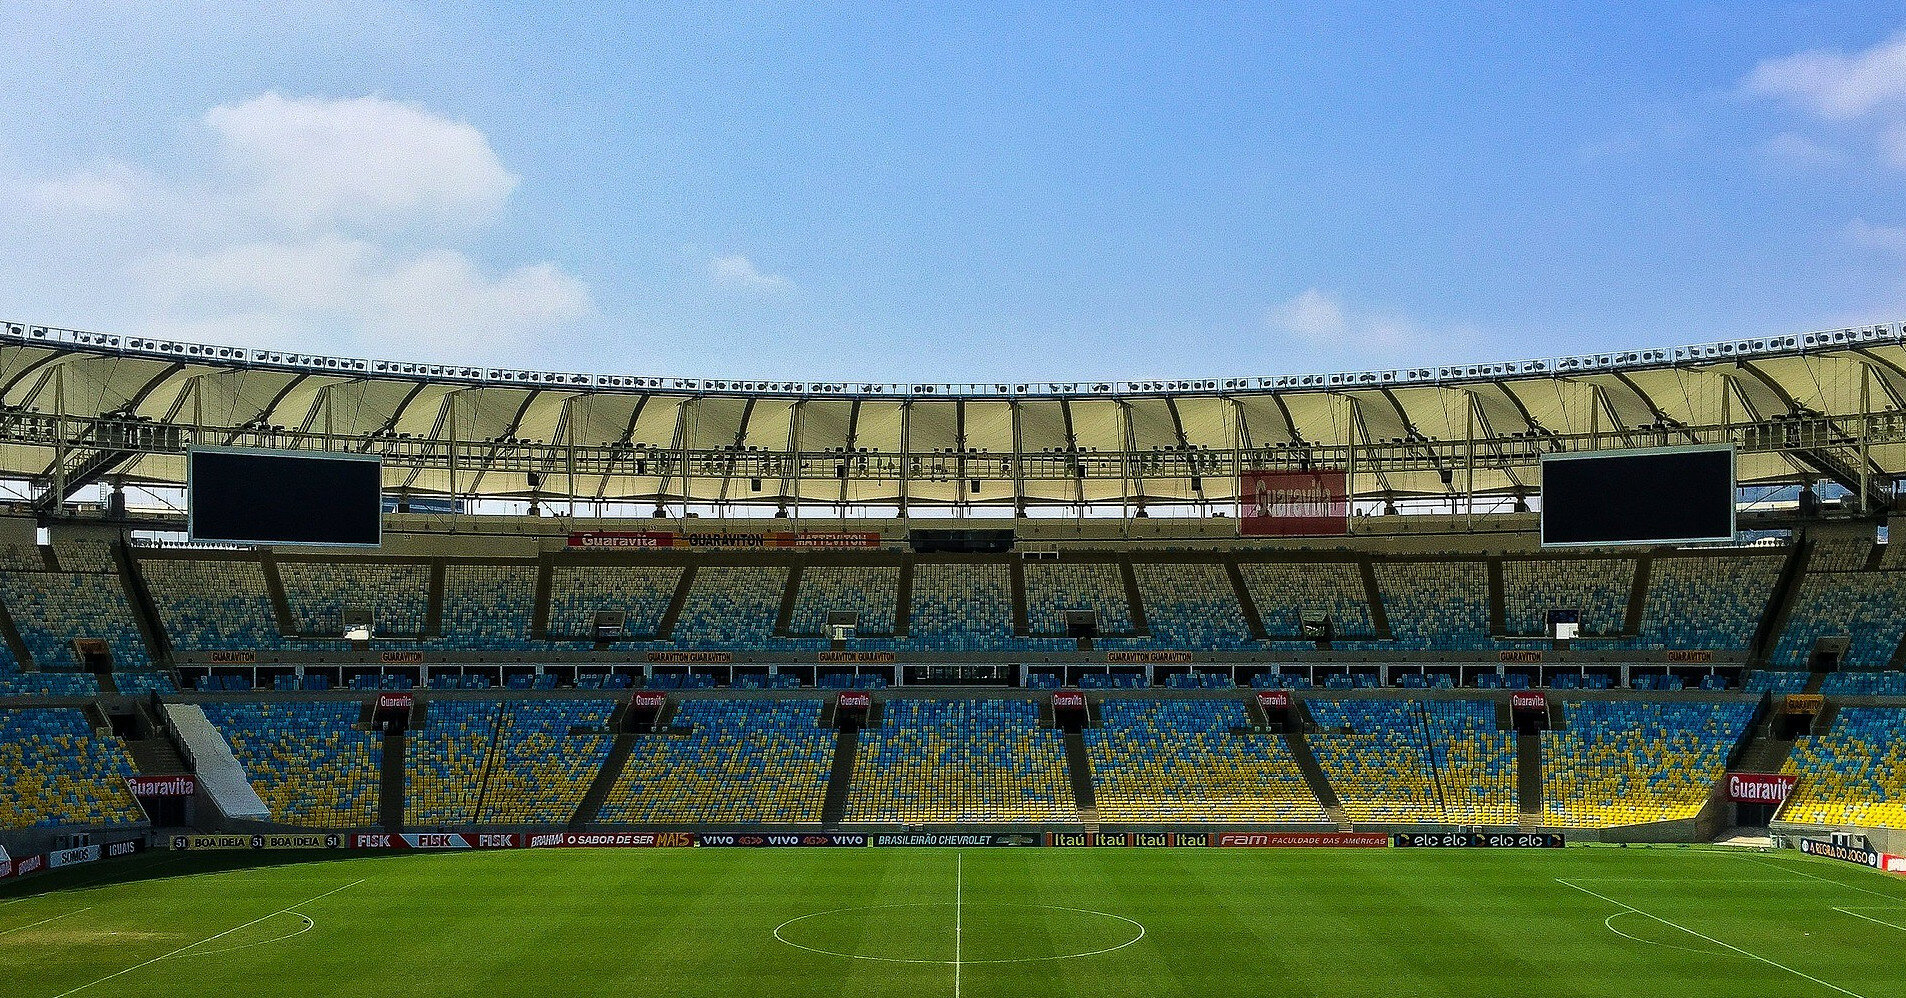 УПЛ подтвердила перенос матча за Суперкубок Украины на сентябрь